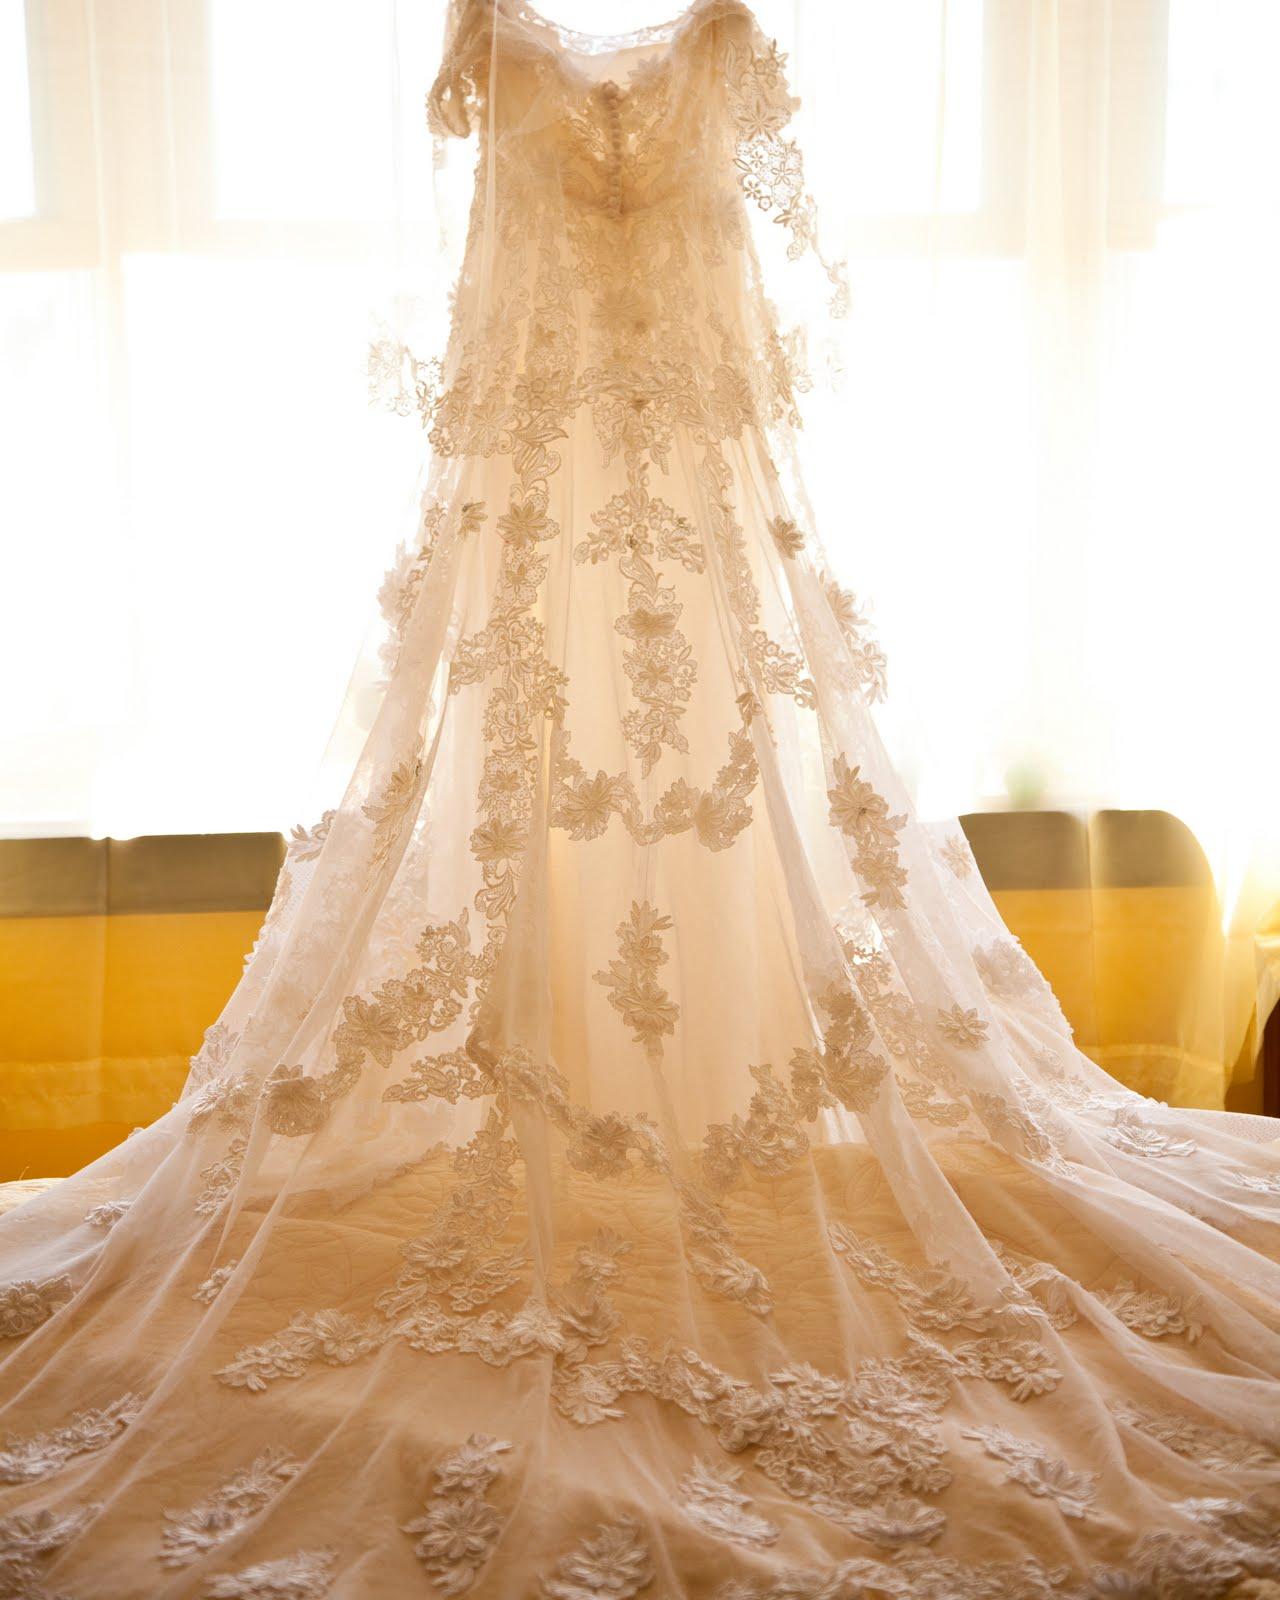 SW Photography- Quincy MA Wedding Photographer: Priscilla